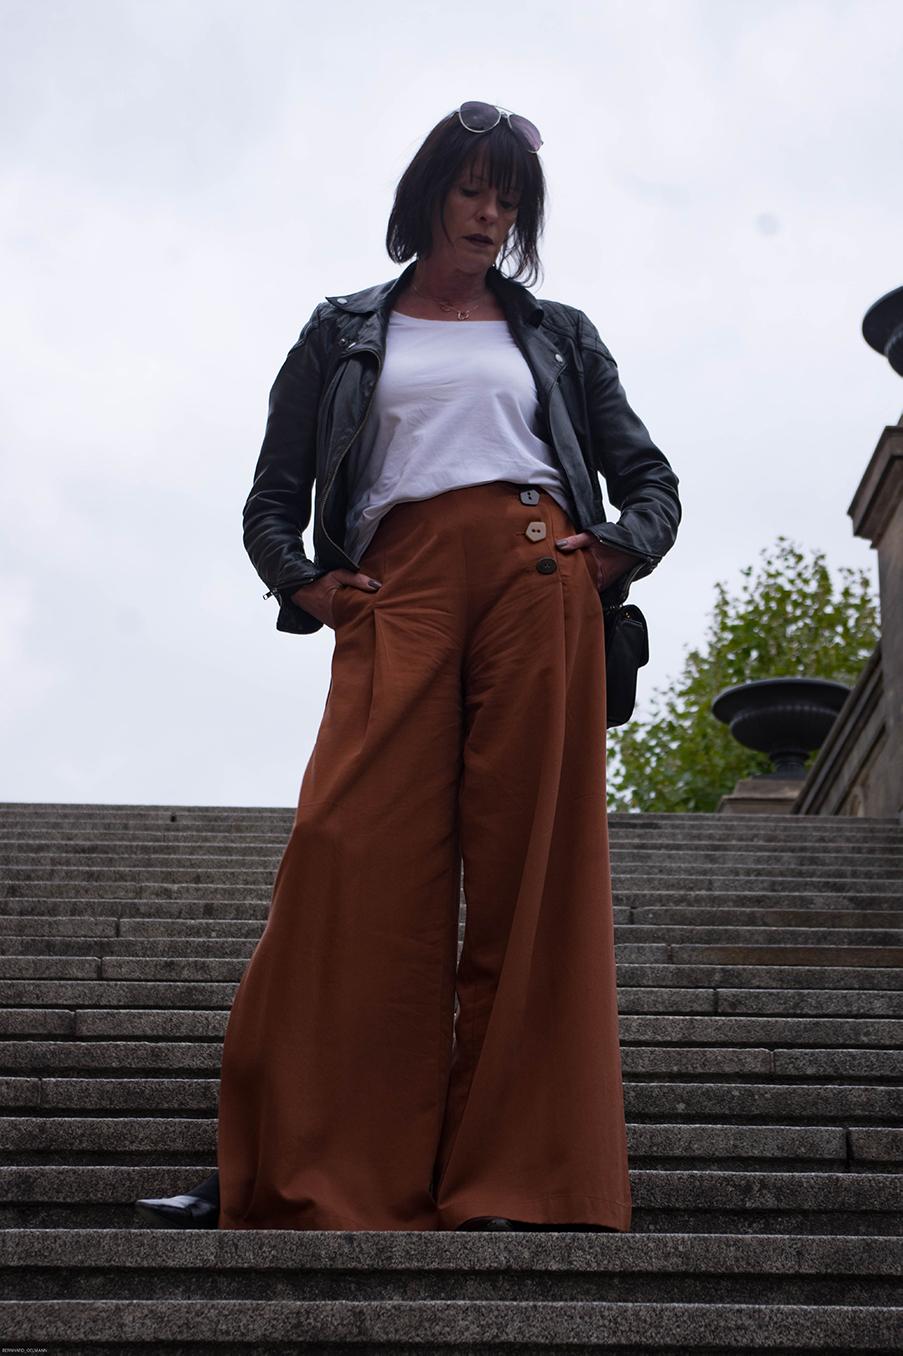 Just-take-a-look Berlin - Internetpräsenz - Outfit Museumsinsel-16.1